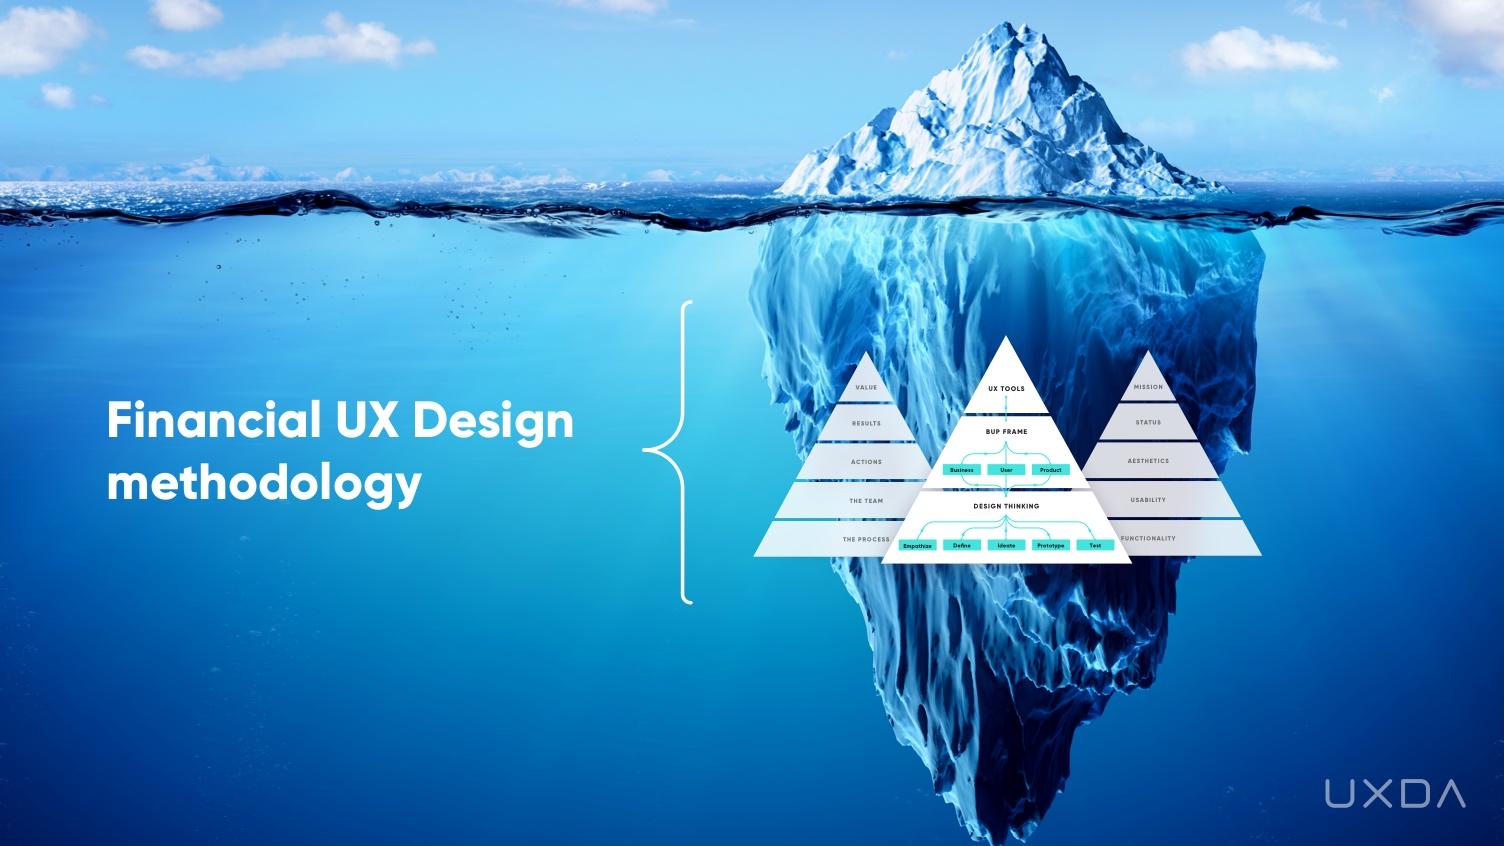 financial-ux-design-digital-product-2-1.jpg